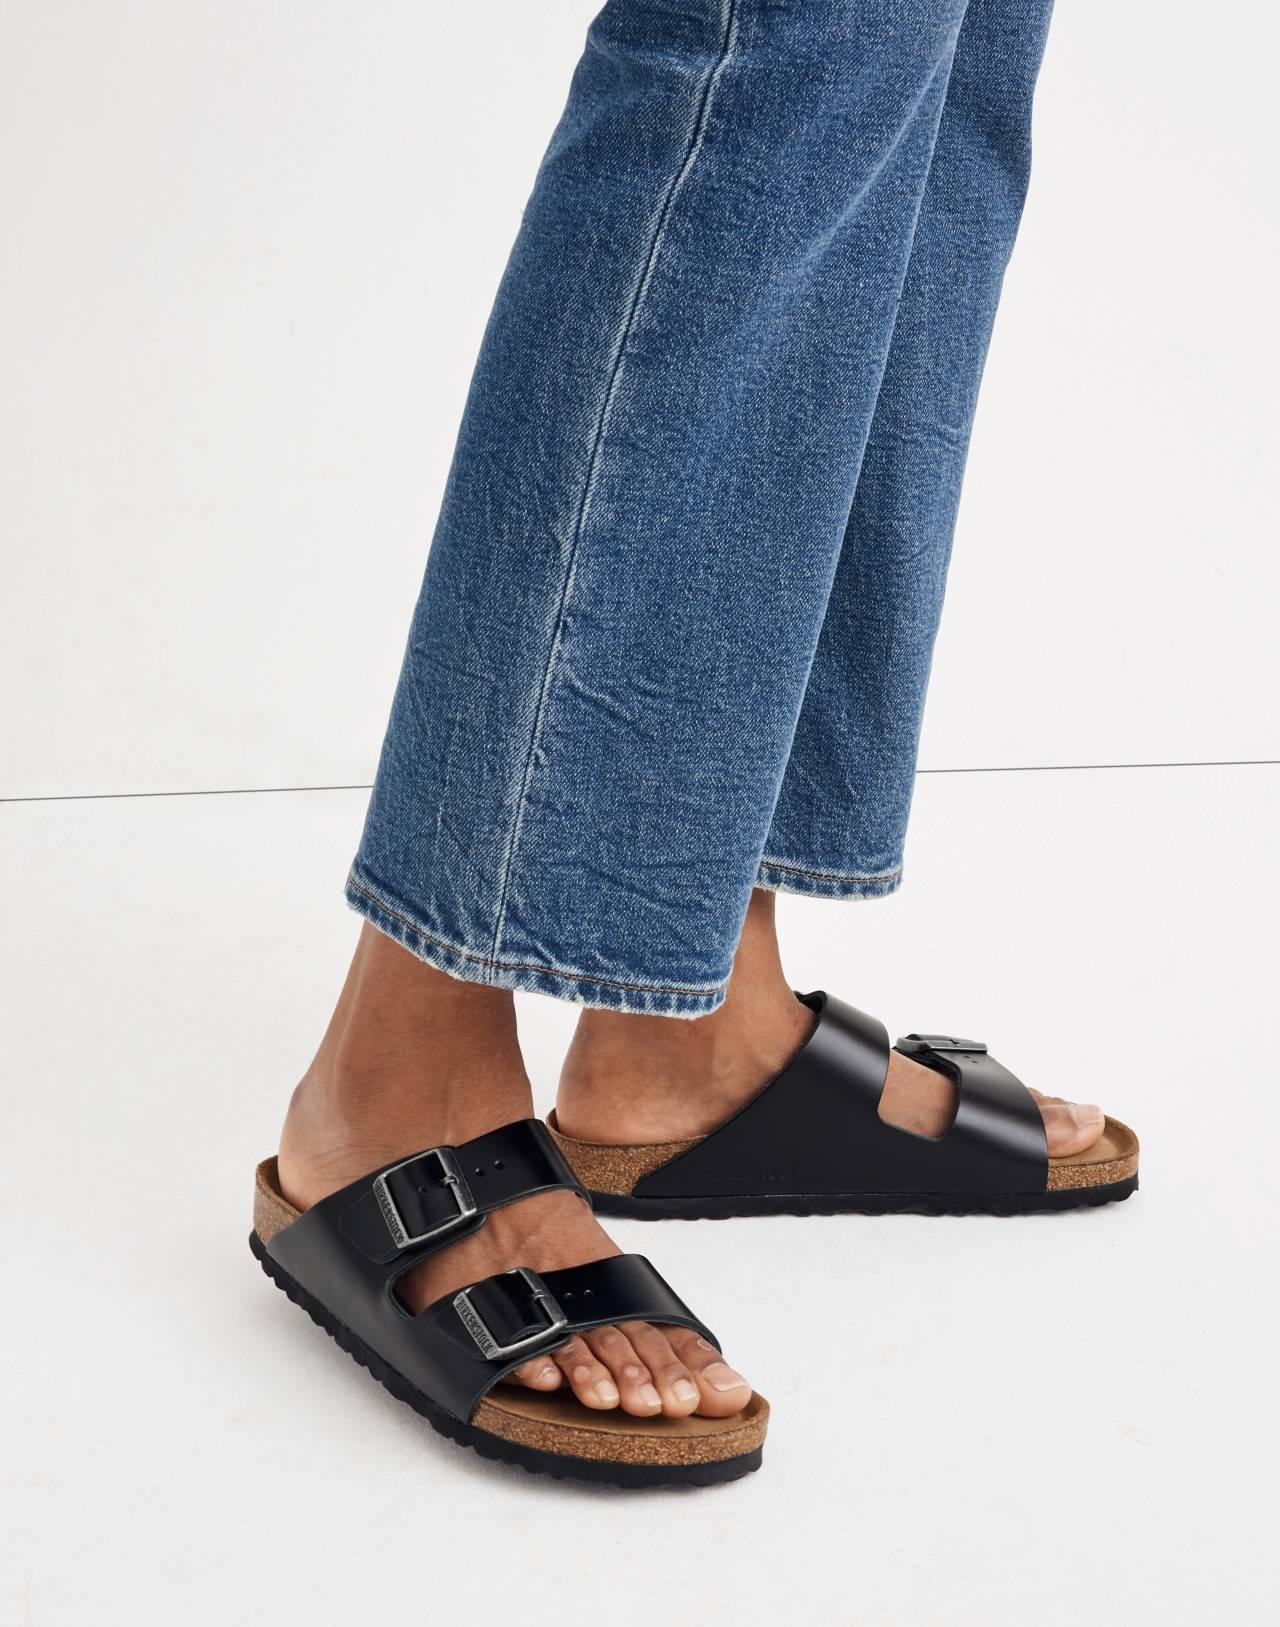 Birkenstock® Arizona Sandals in Black Leather in true black image 2